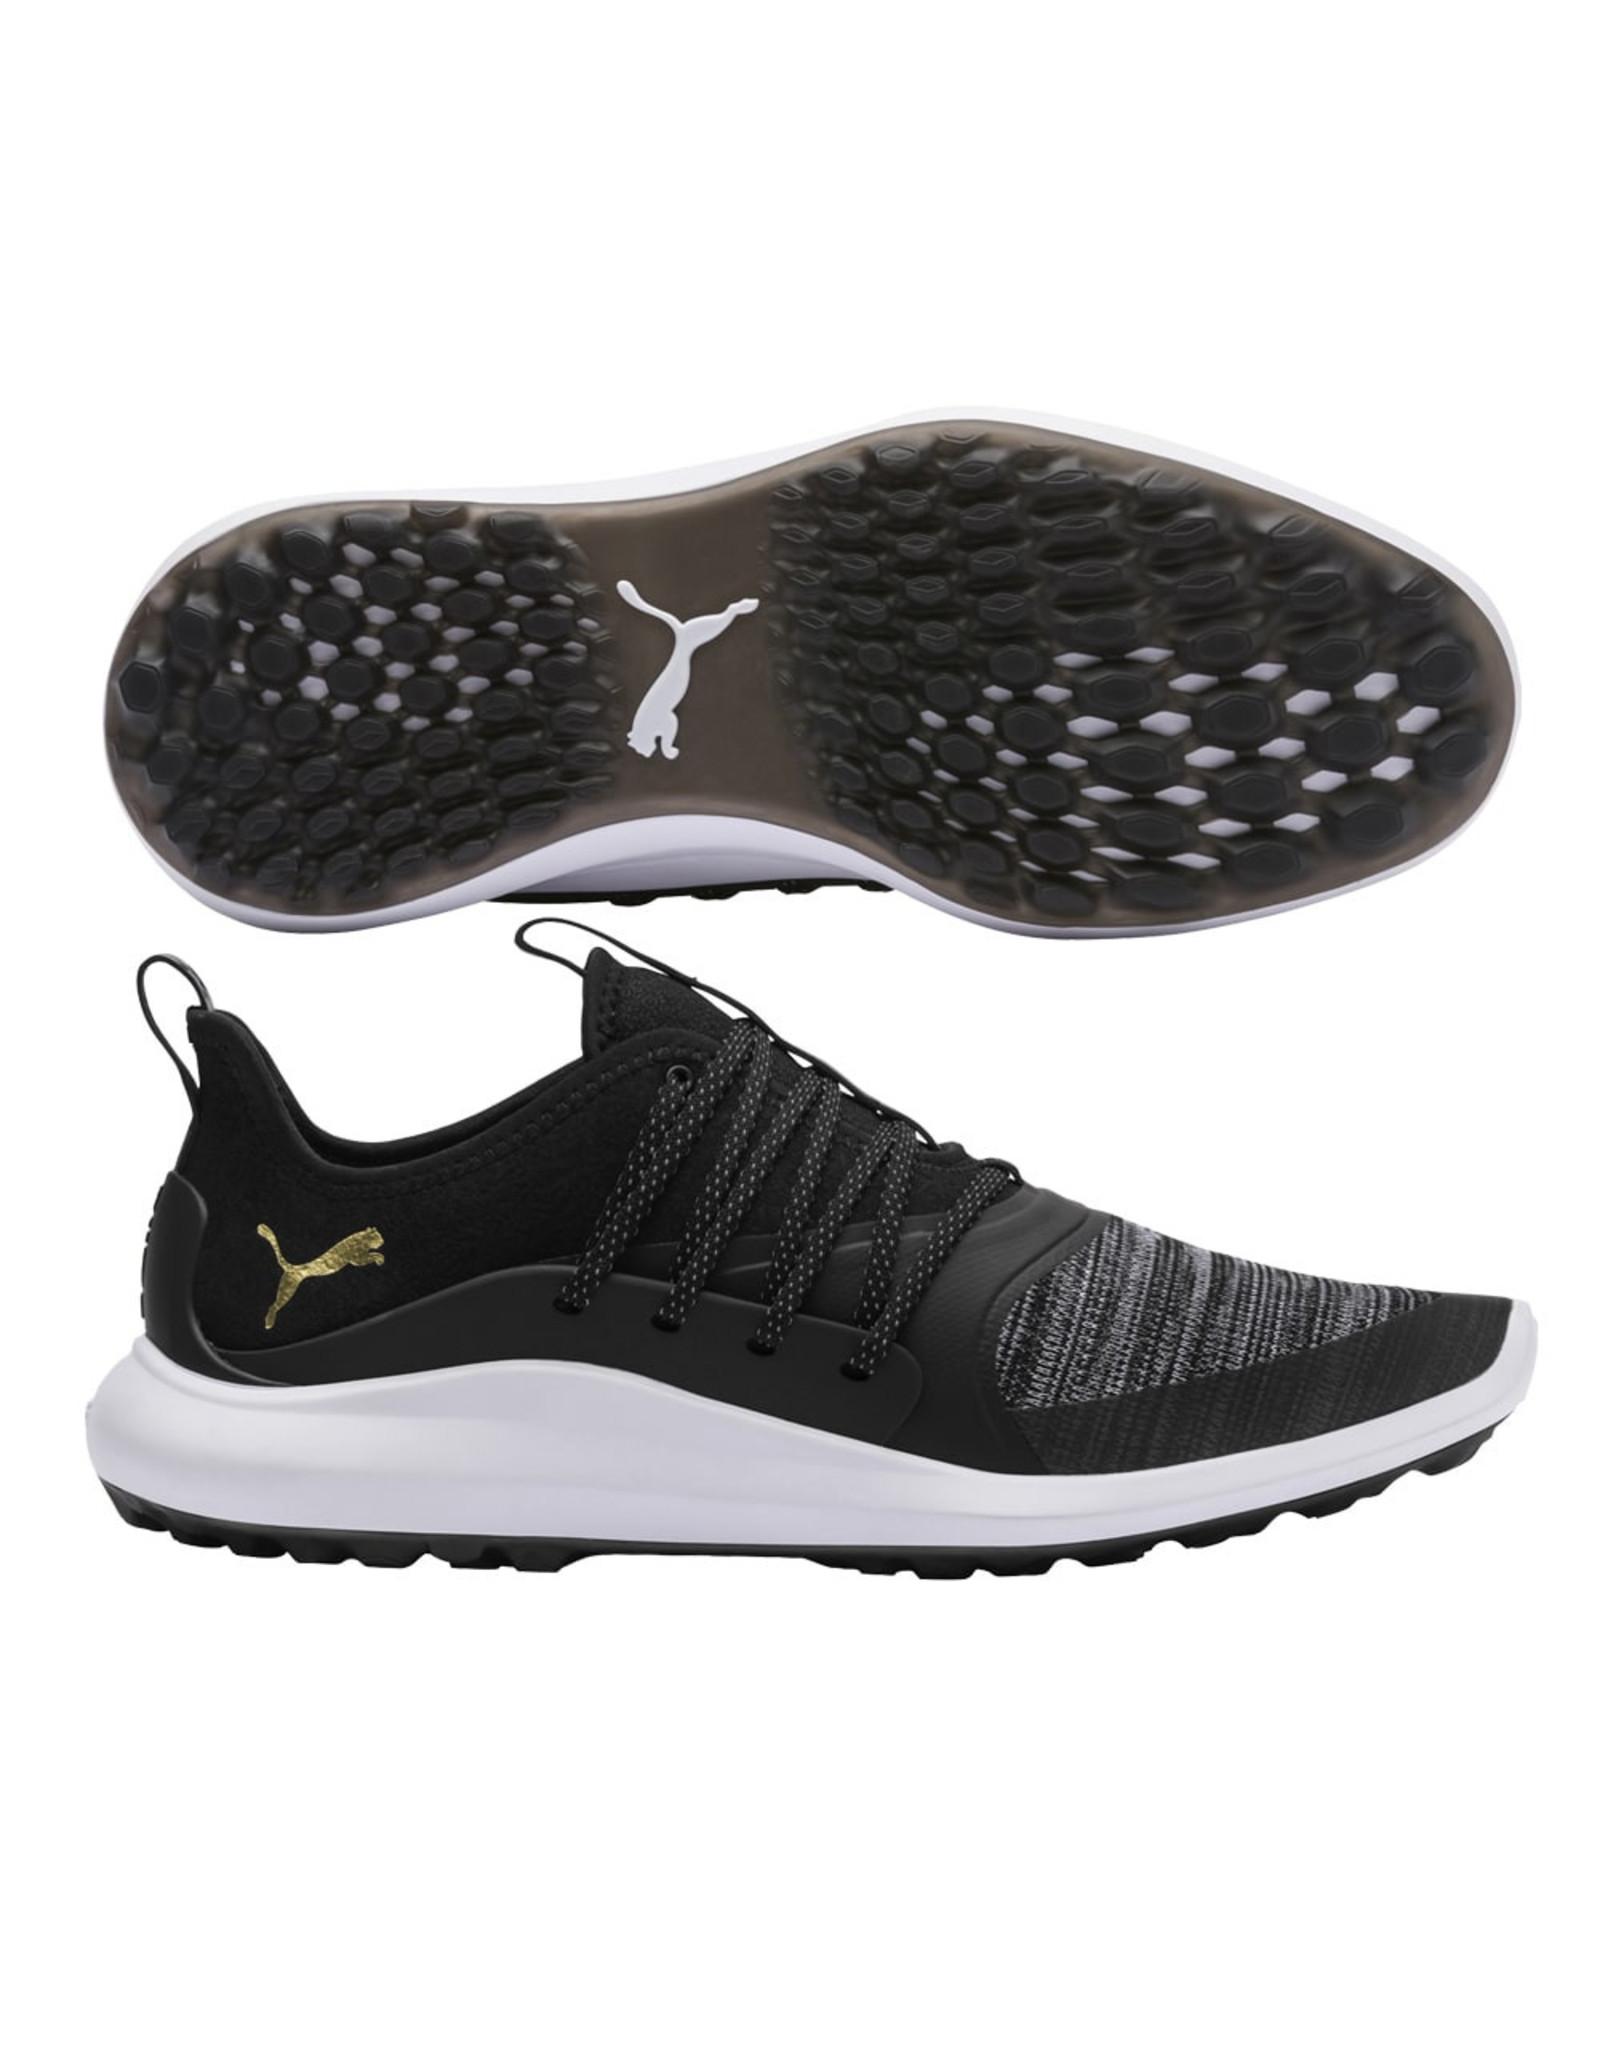 Puma Golf Puma Men's Ignite NXT Solelace Golf Shoes